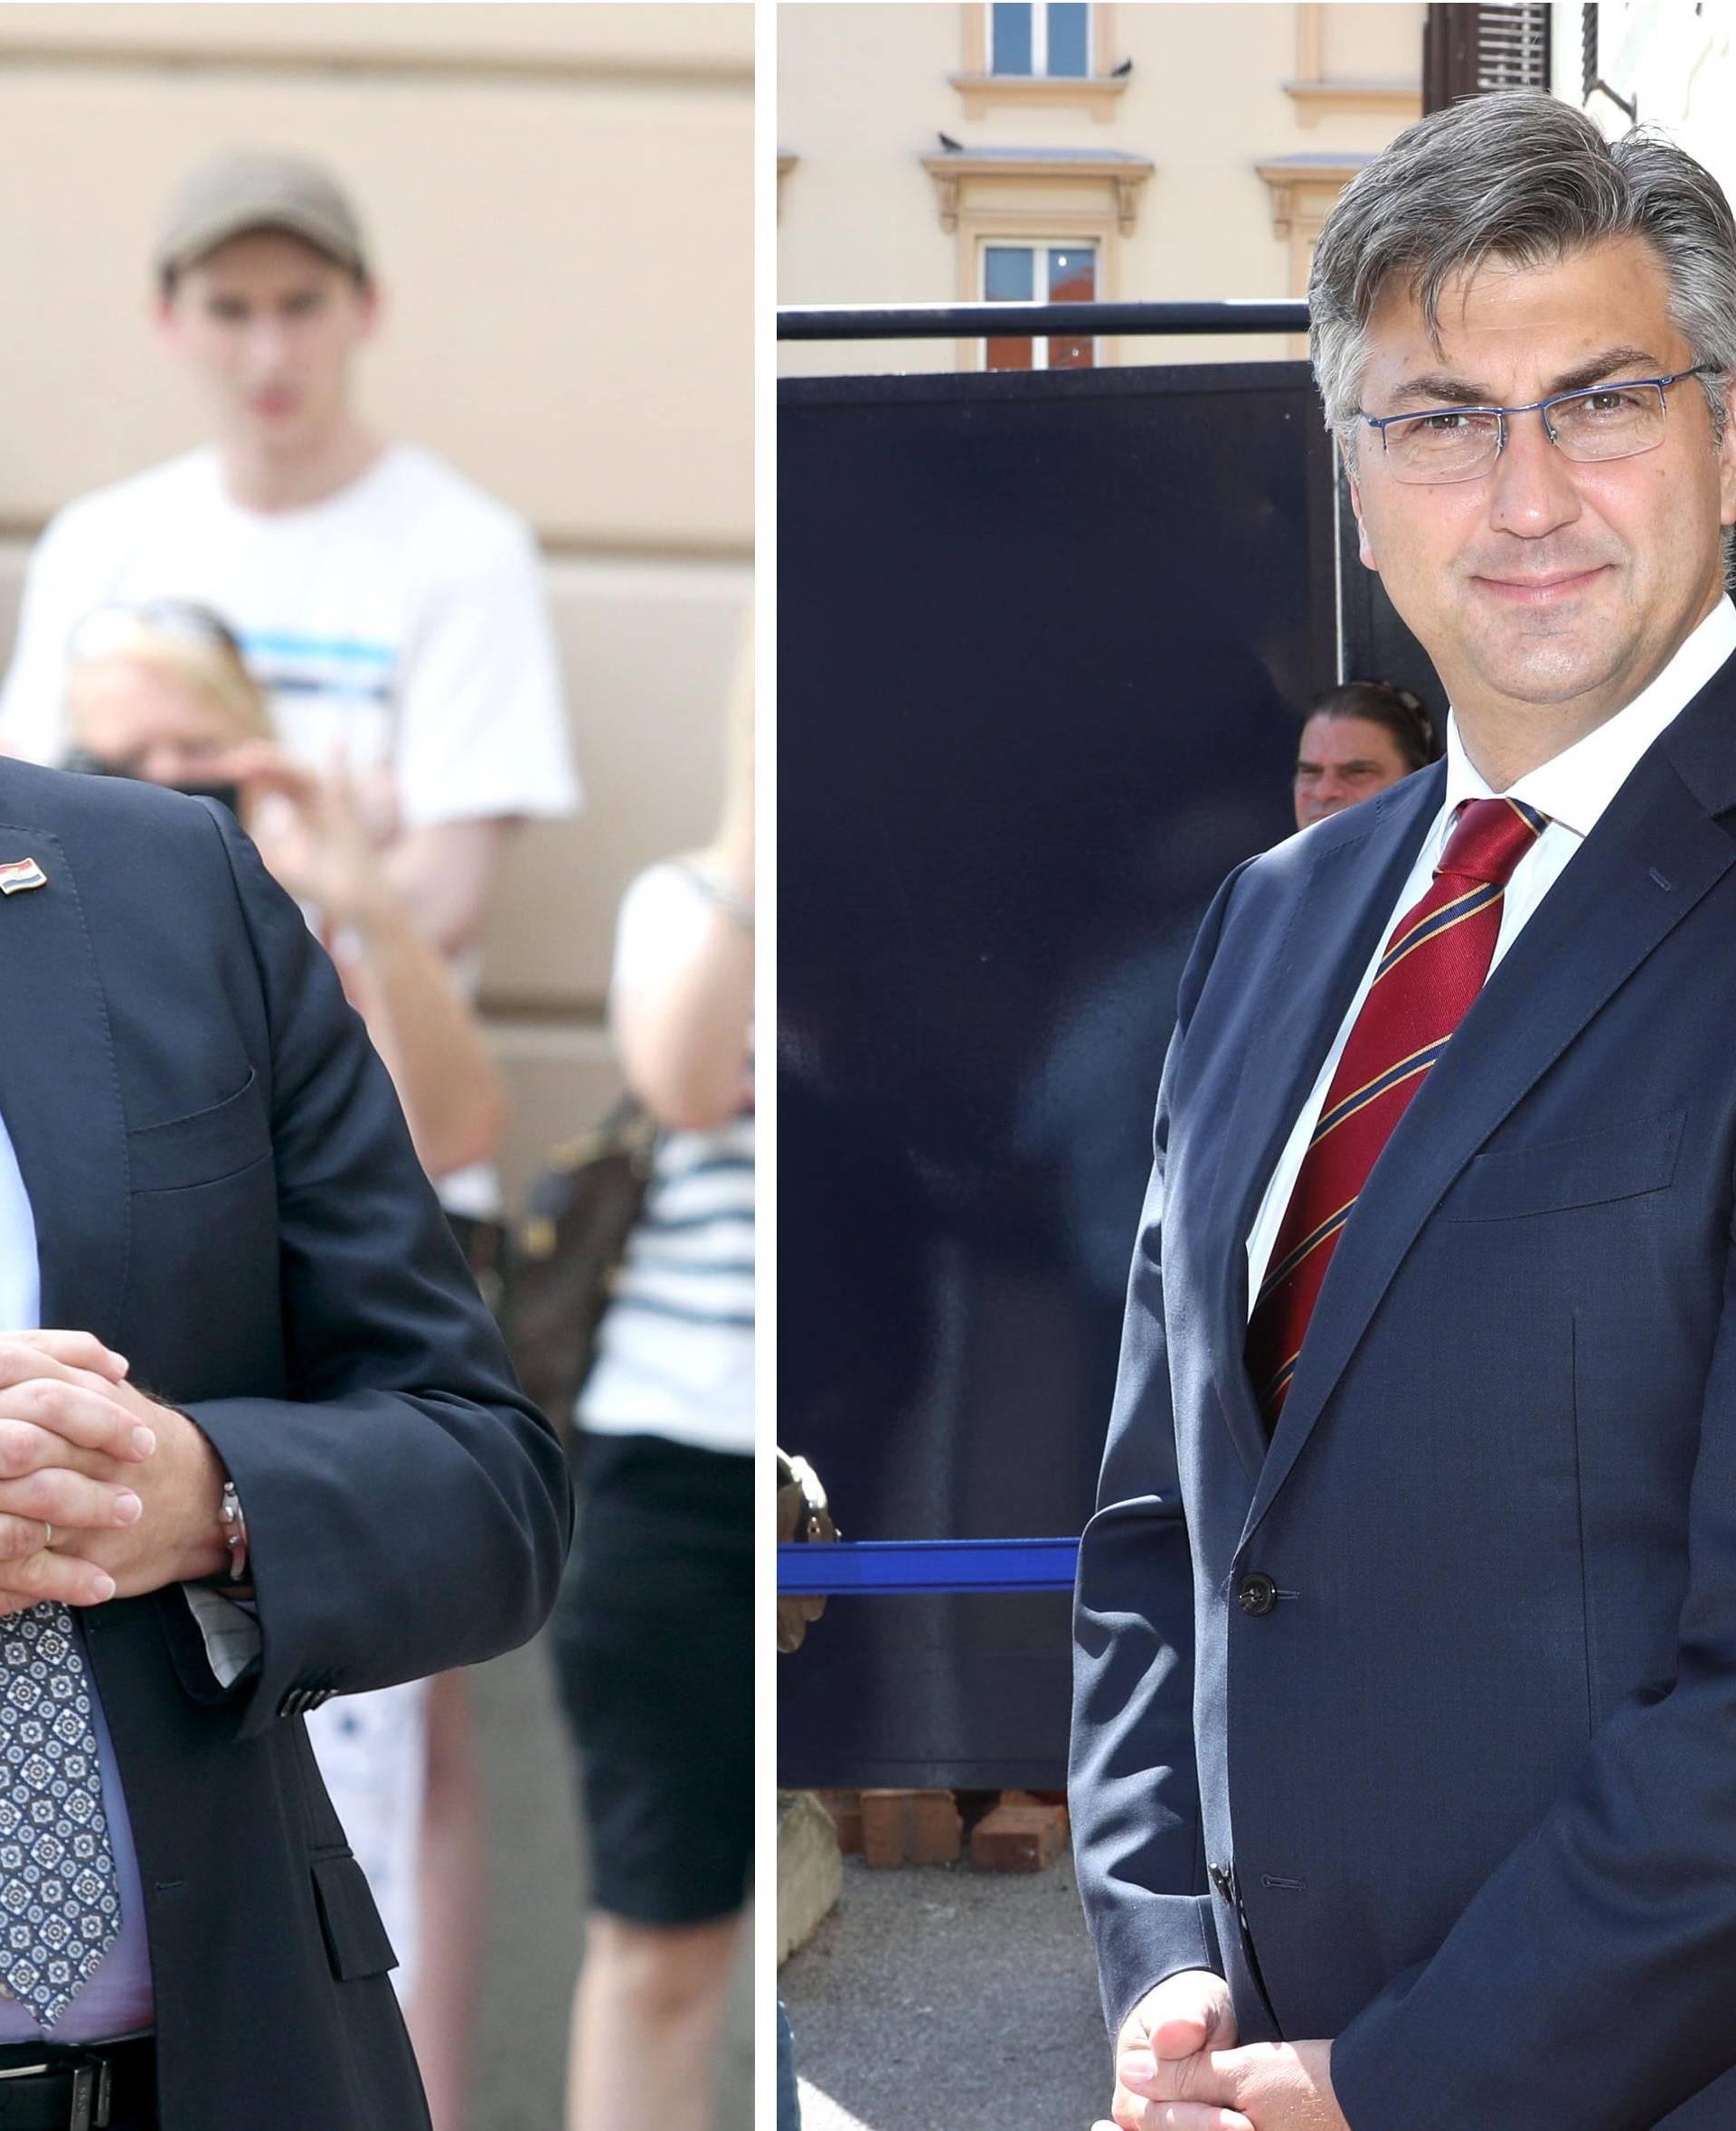 Premijer se pohvalio skidanjem kilograma: 'Puno mi je lakše...'